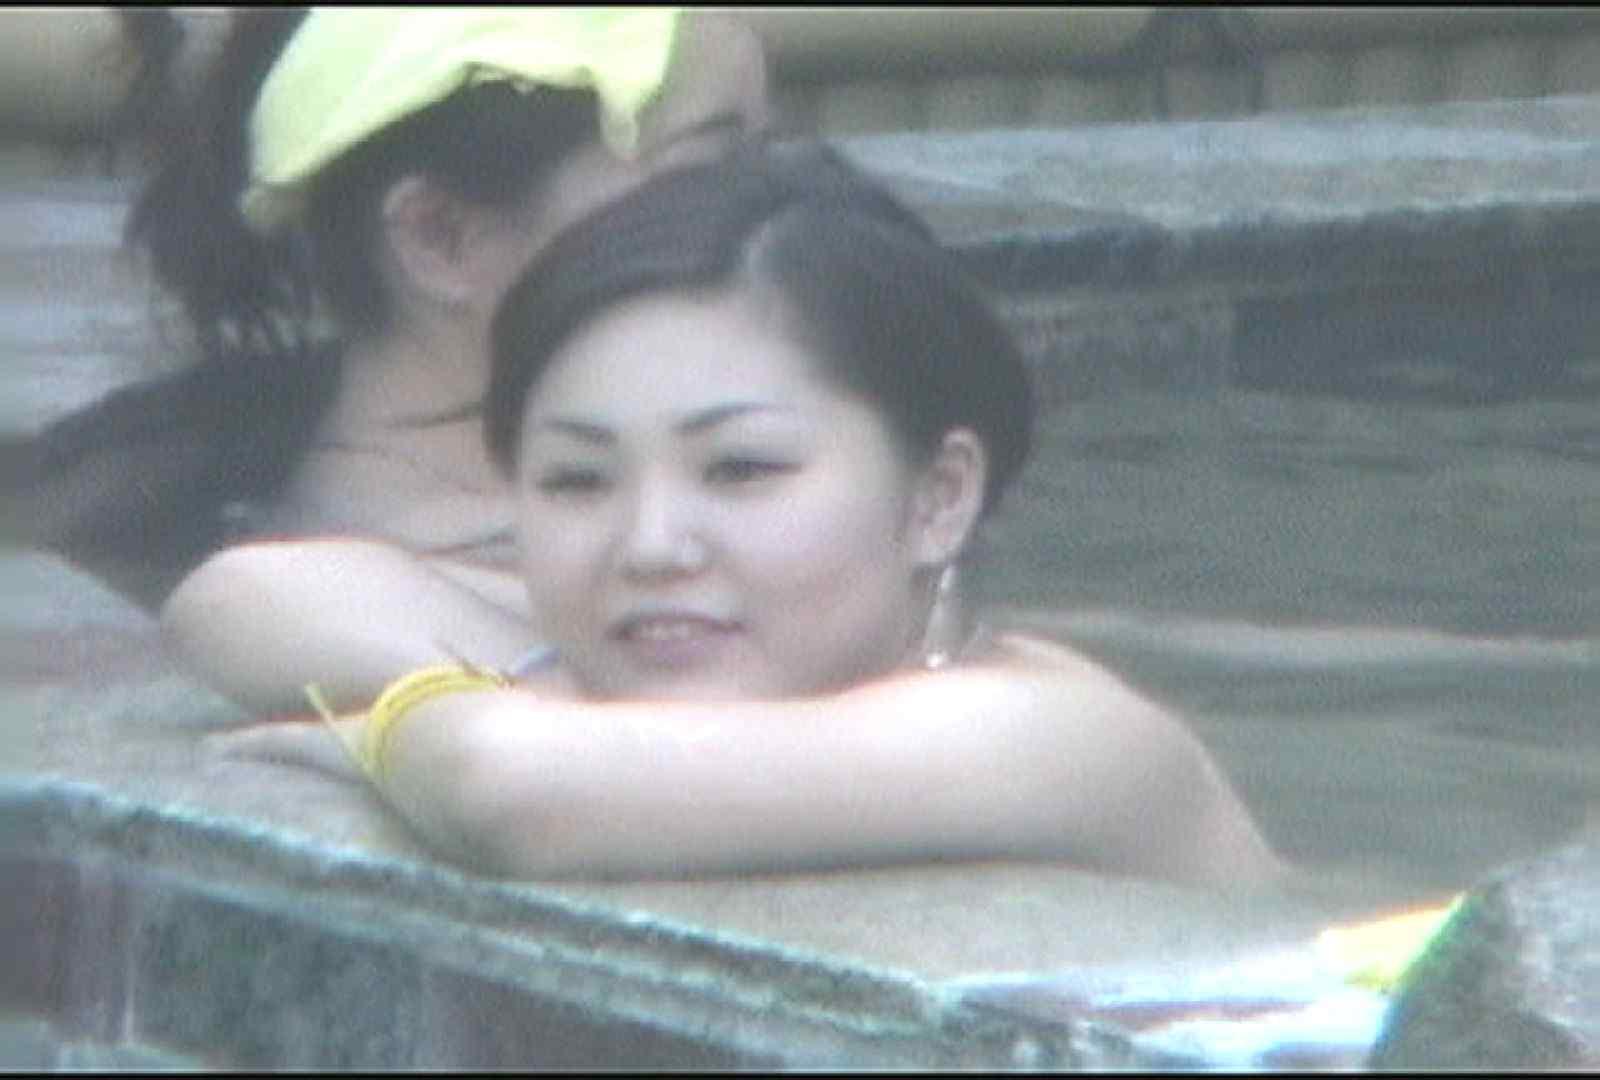 Aquaな露天風呂Vol.145 盗撮映像  78Pix 23